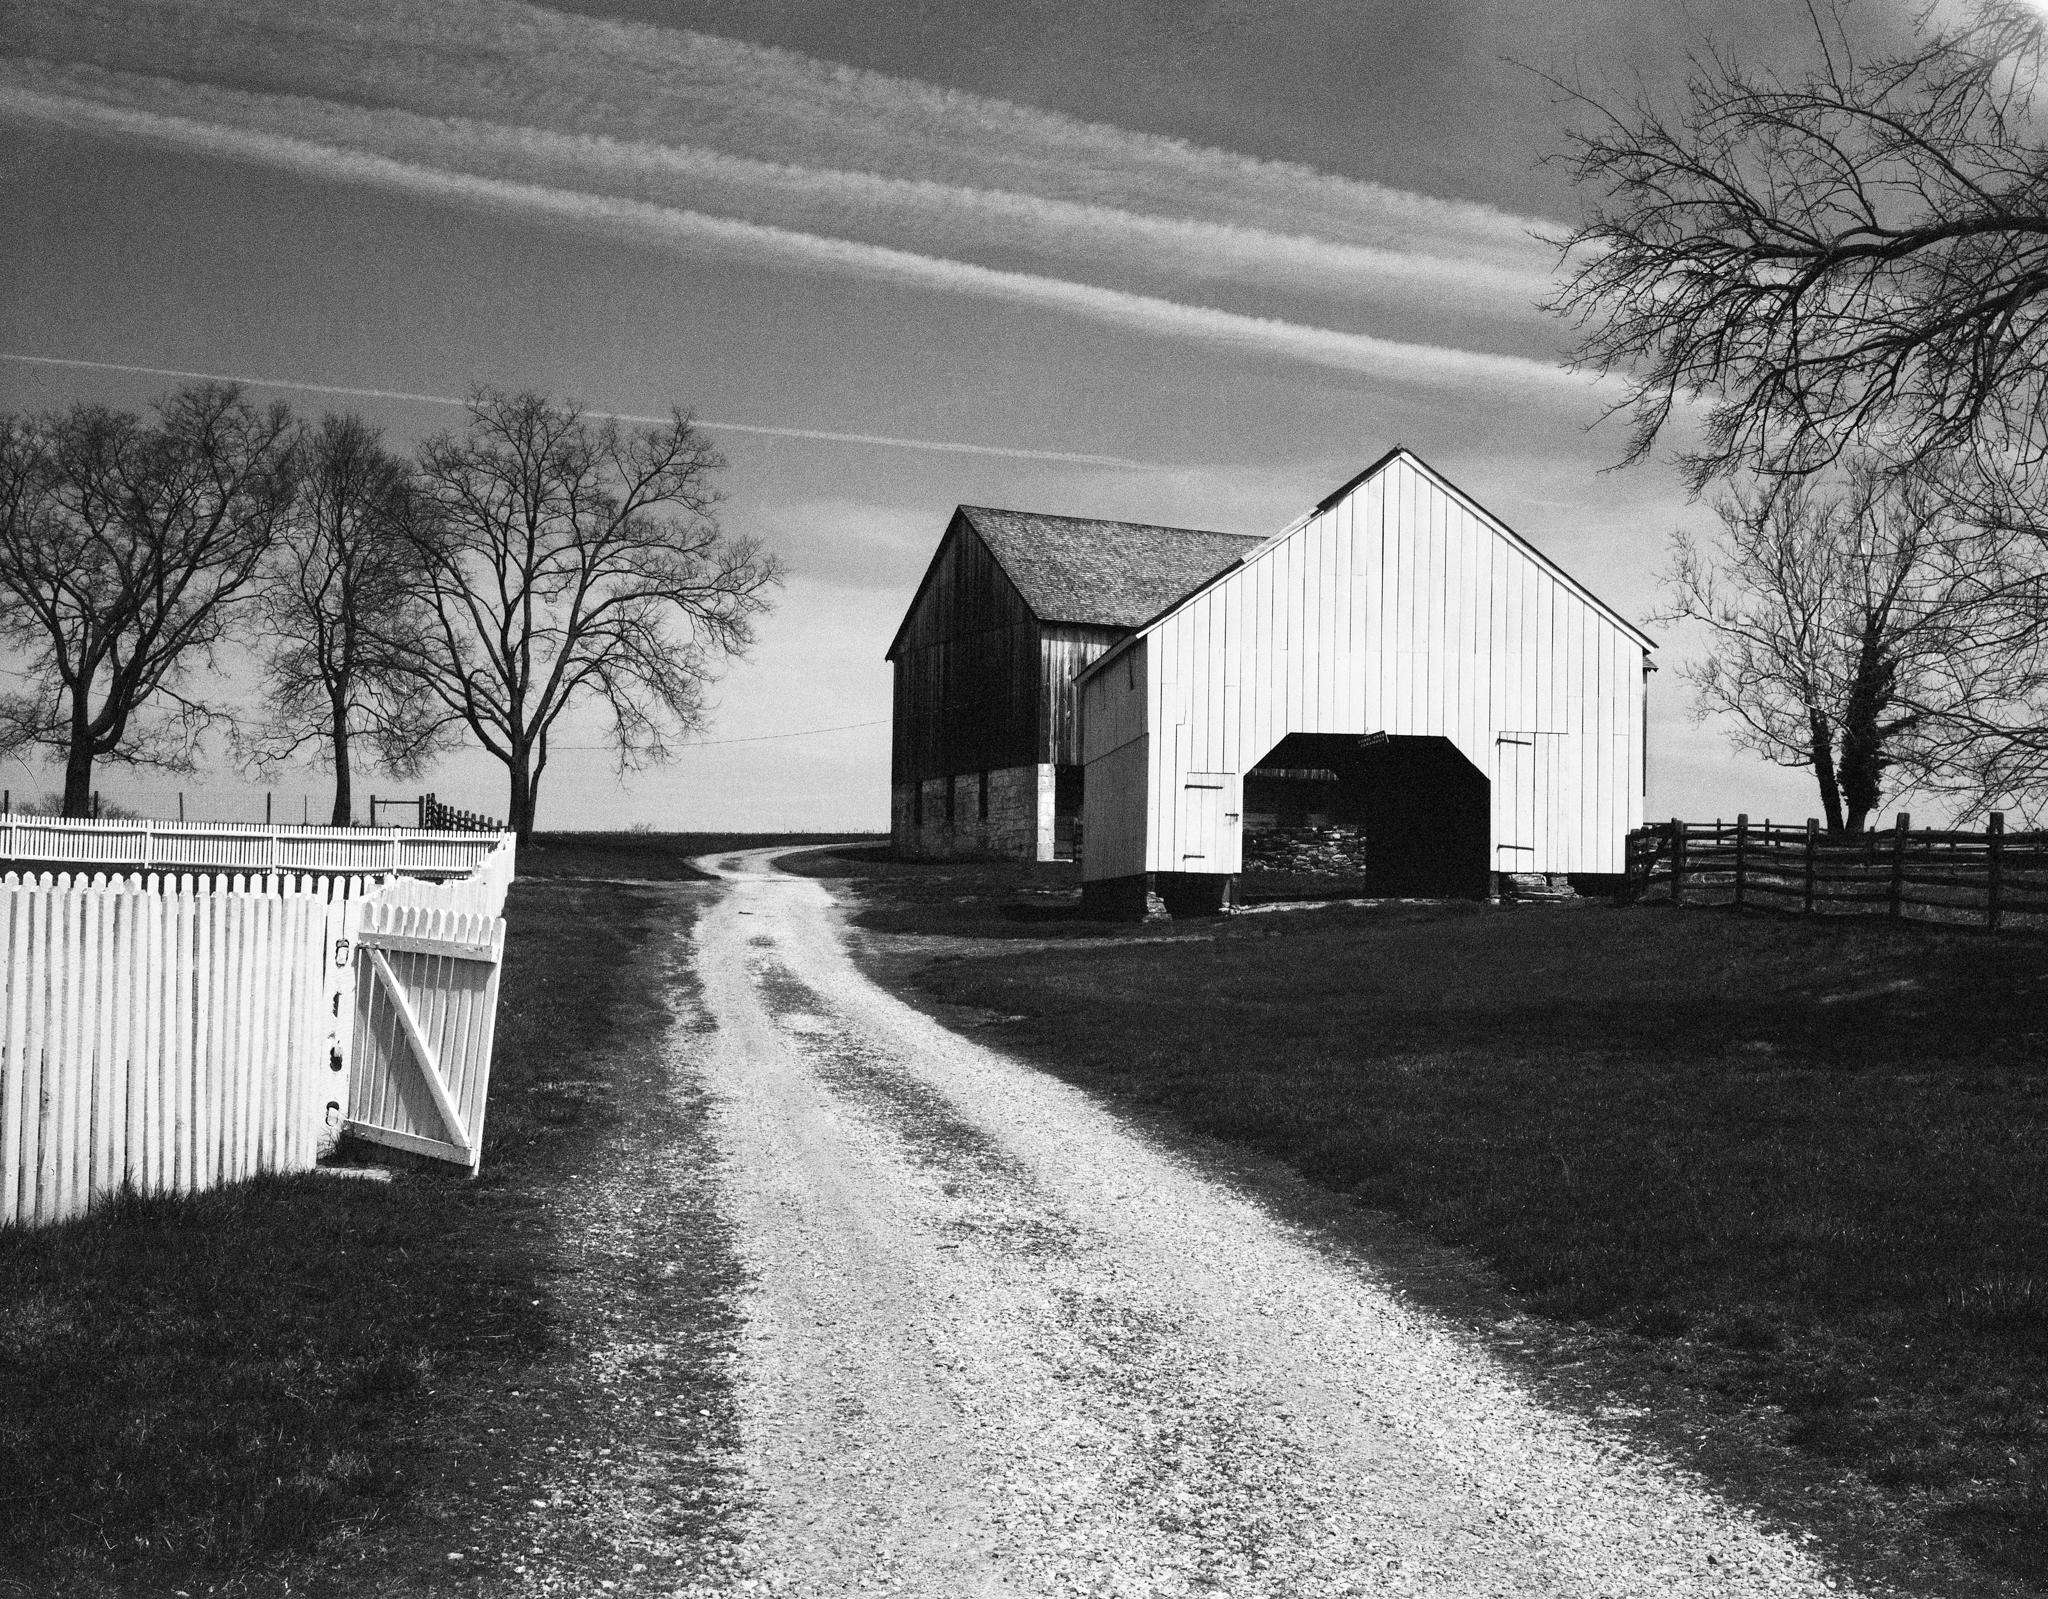 4x5_for_365_project_0105_Antietam_Battlefield_Poffenberger_Farm_Road.jpg